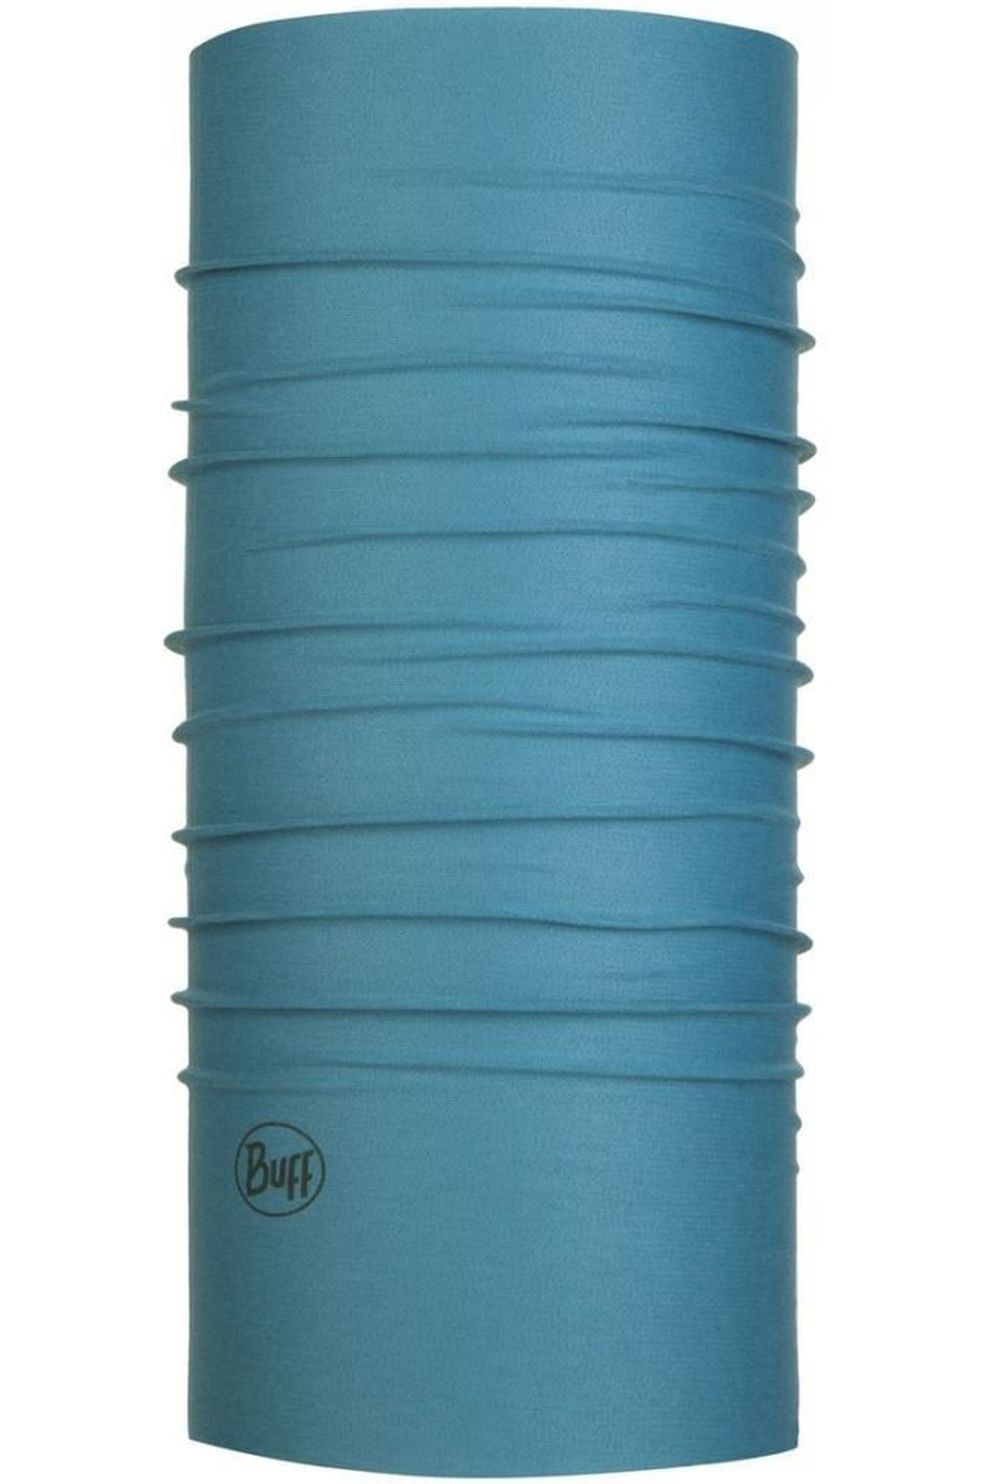 BUFF Buff Coolnet UV+Insect - Blauw